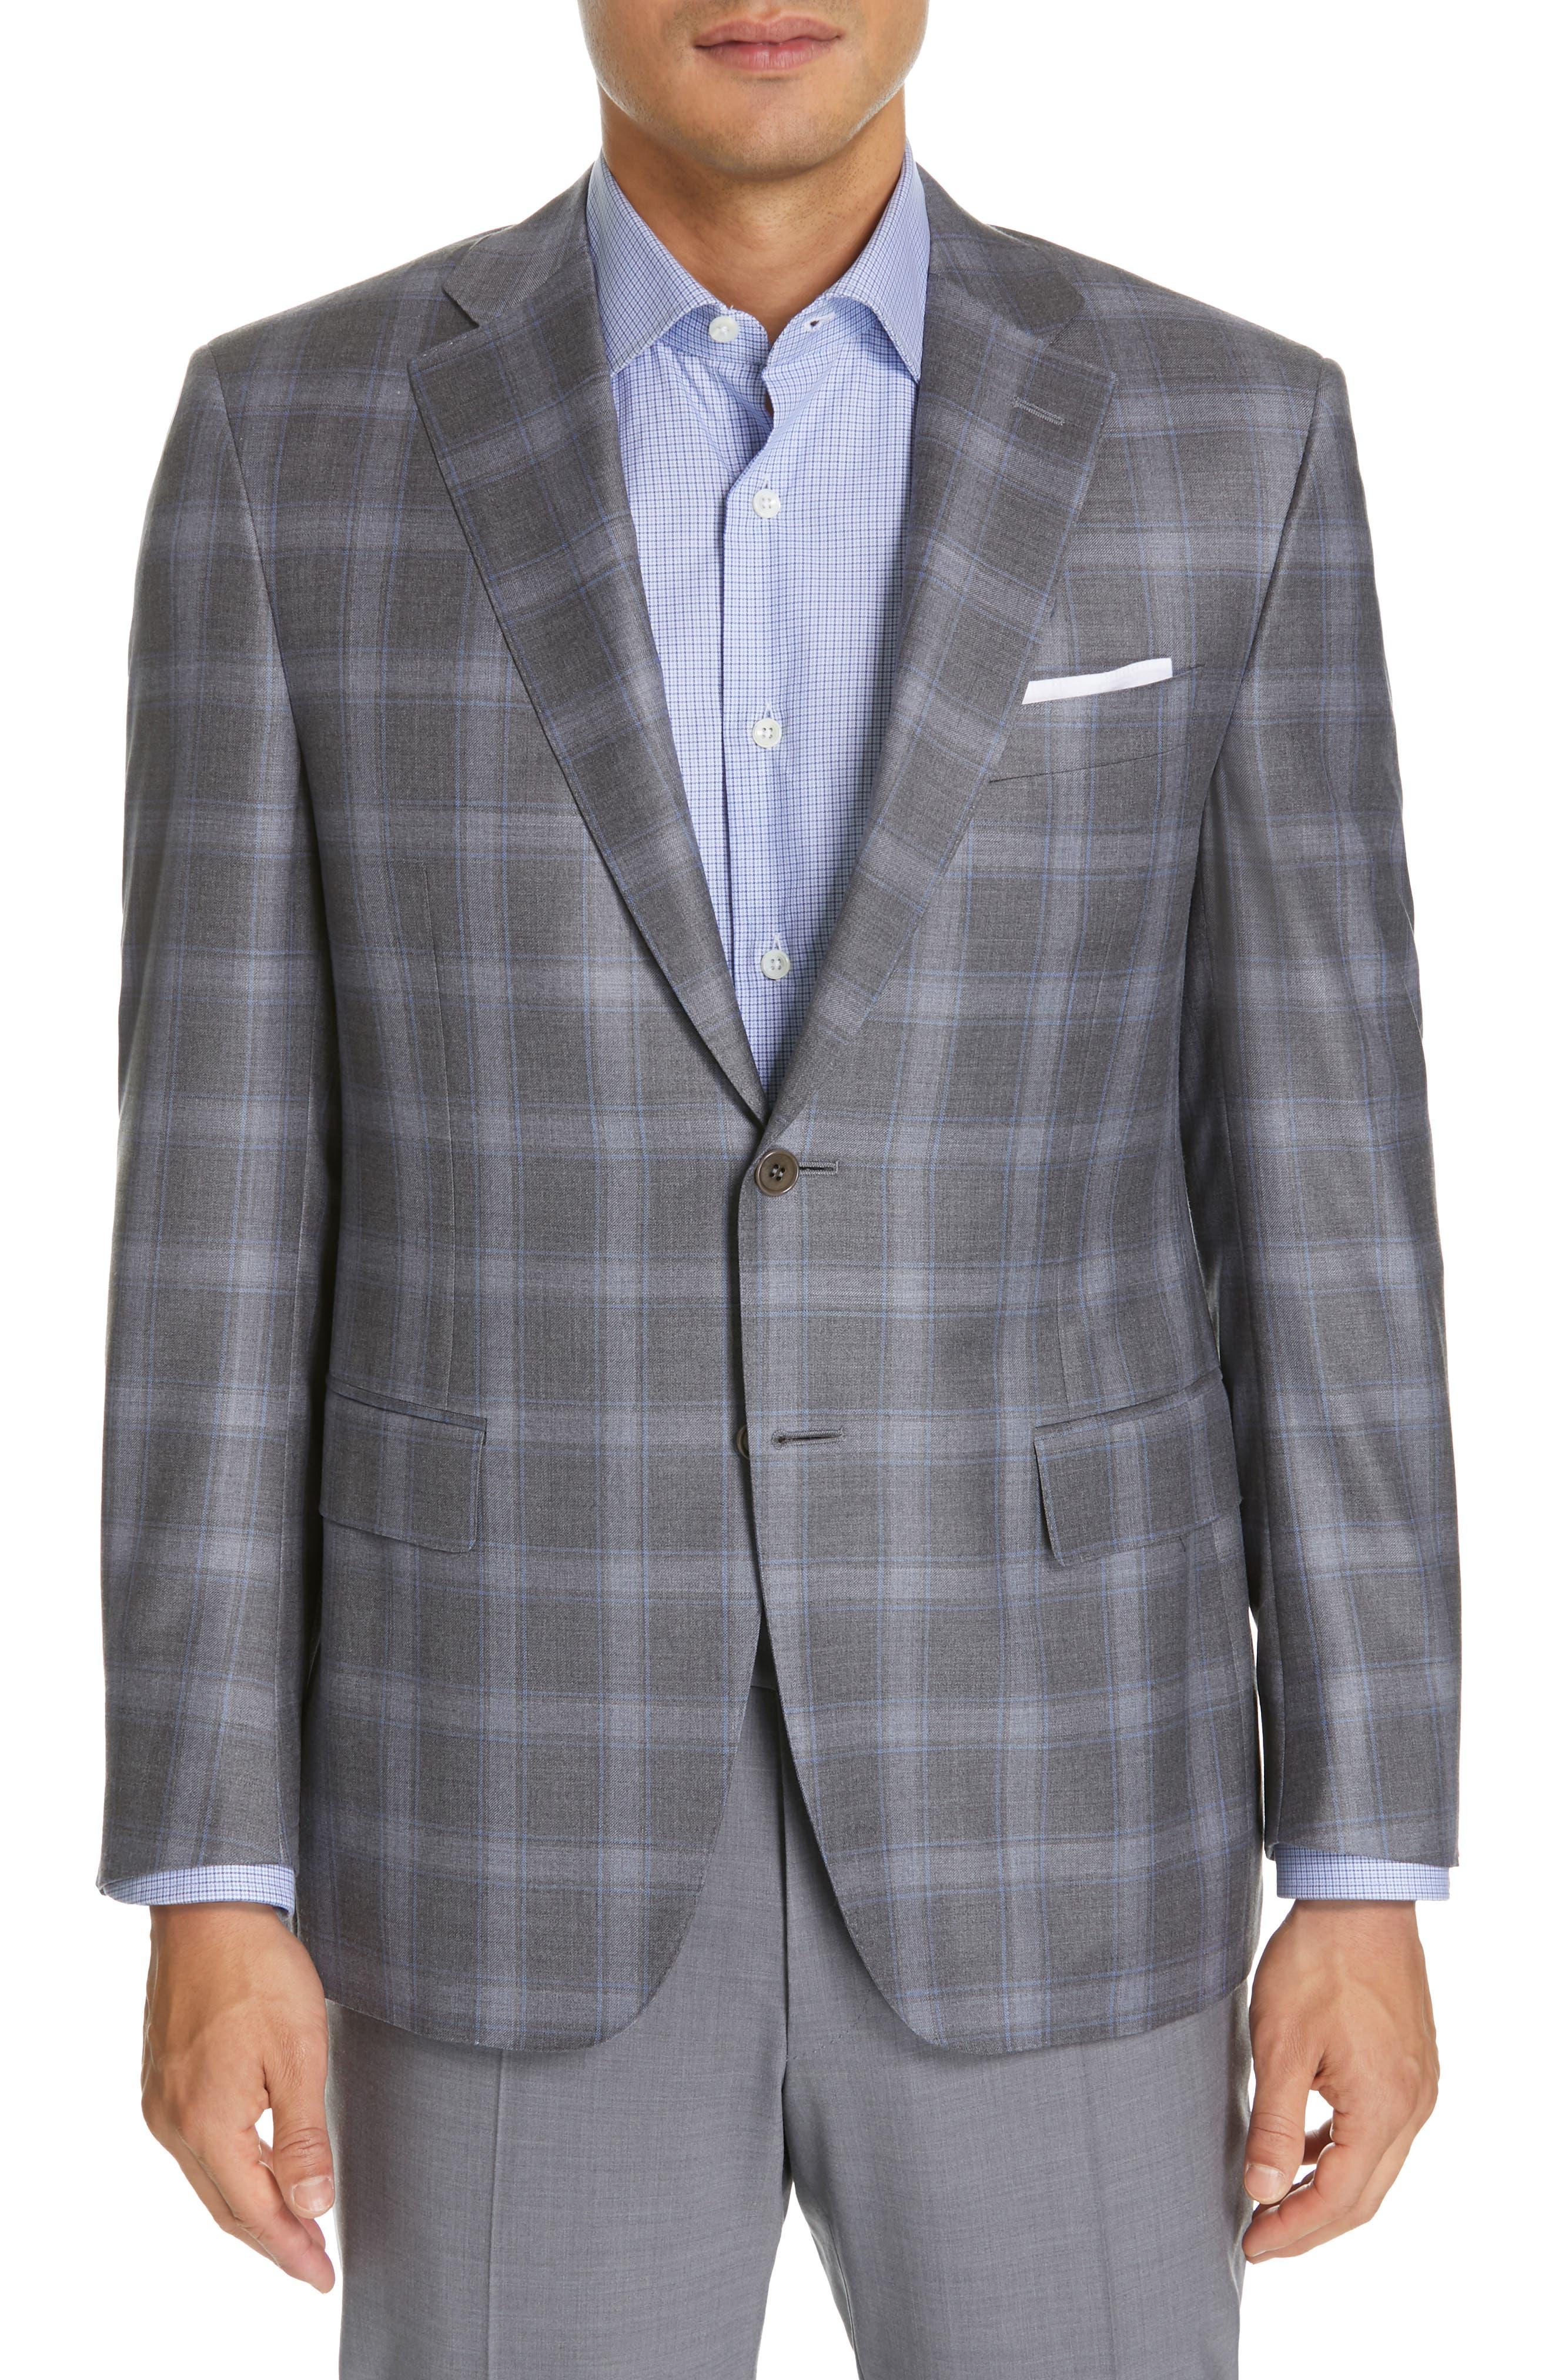 Sienna Classic Fit Plaid Wool Sport Coat, Main, color, GREY